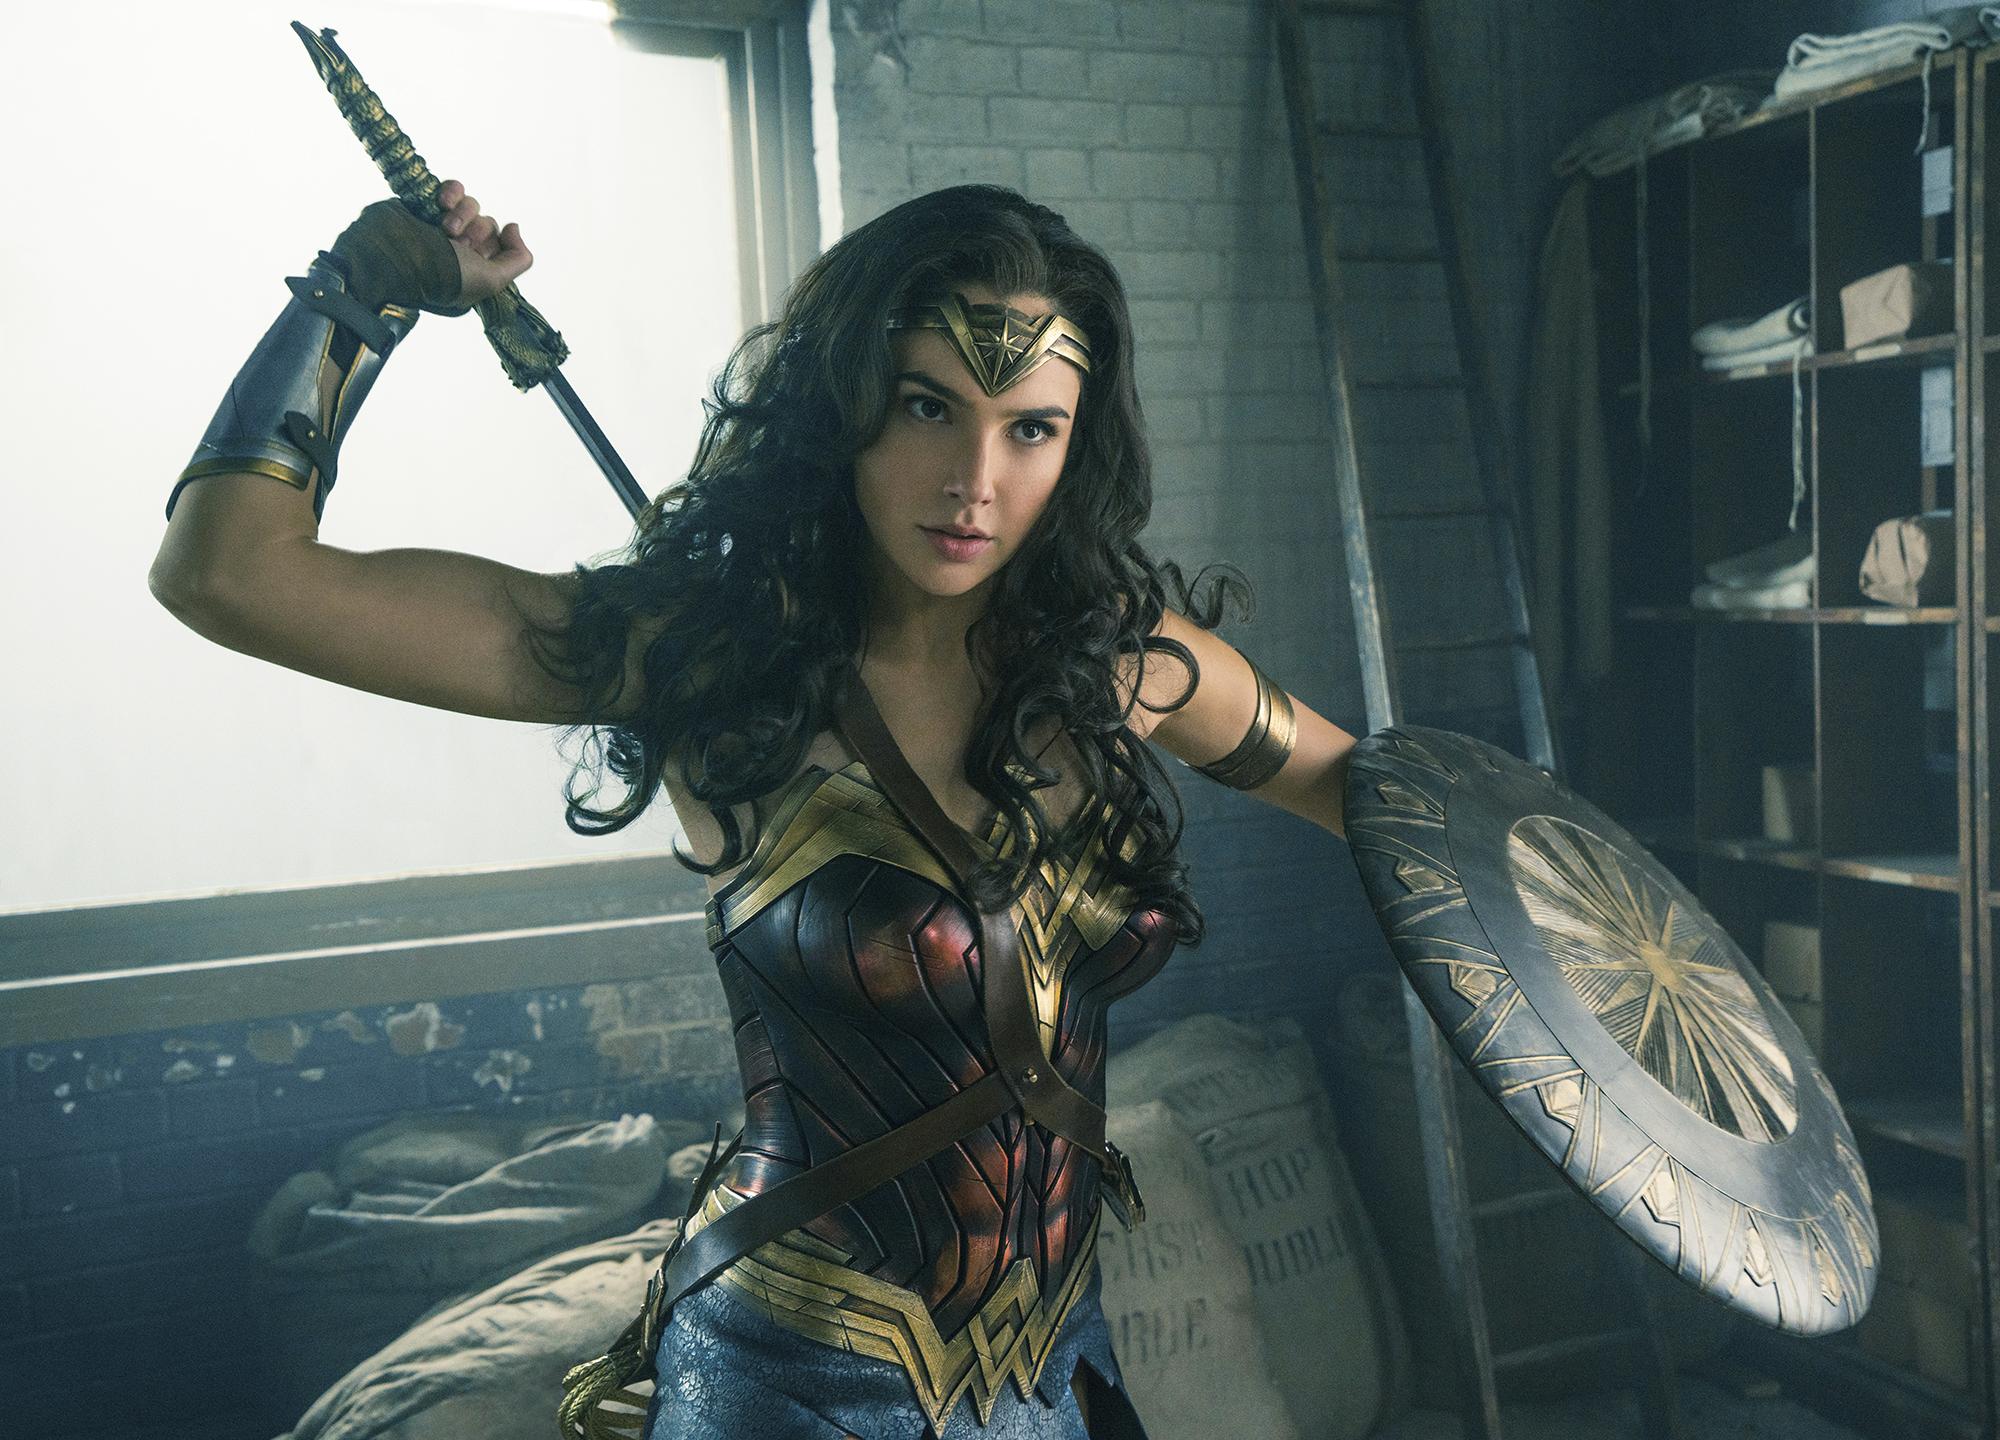 Gal Gadot in Wonder Woman.